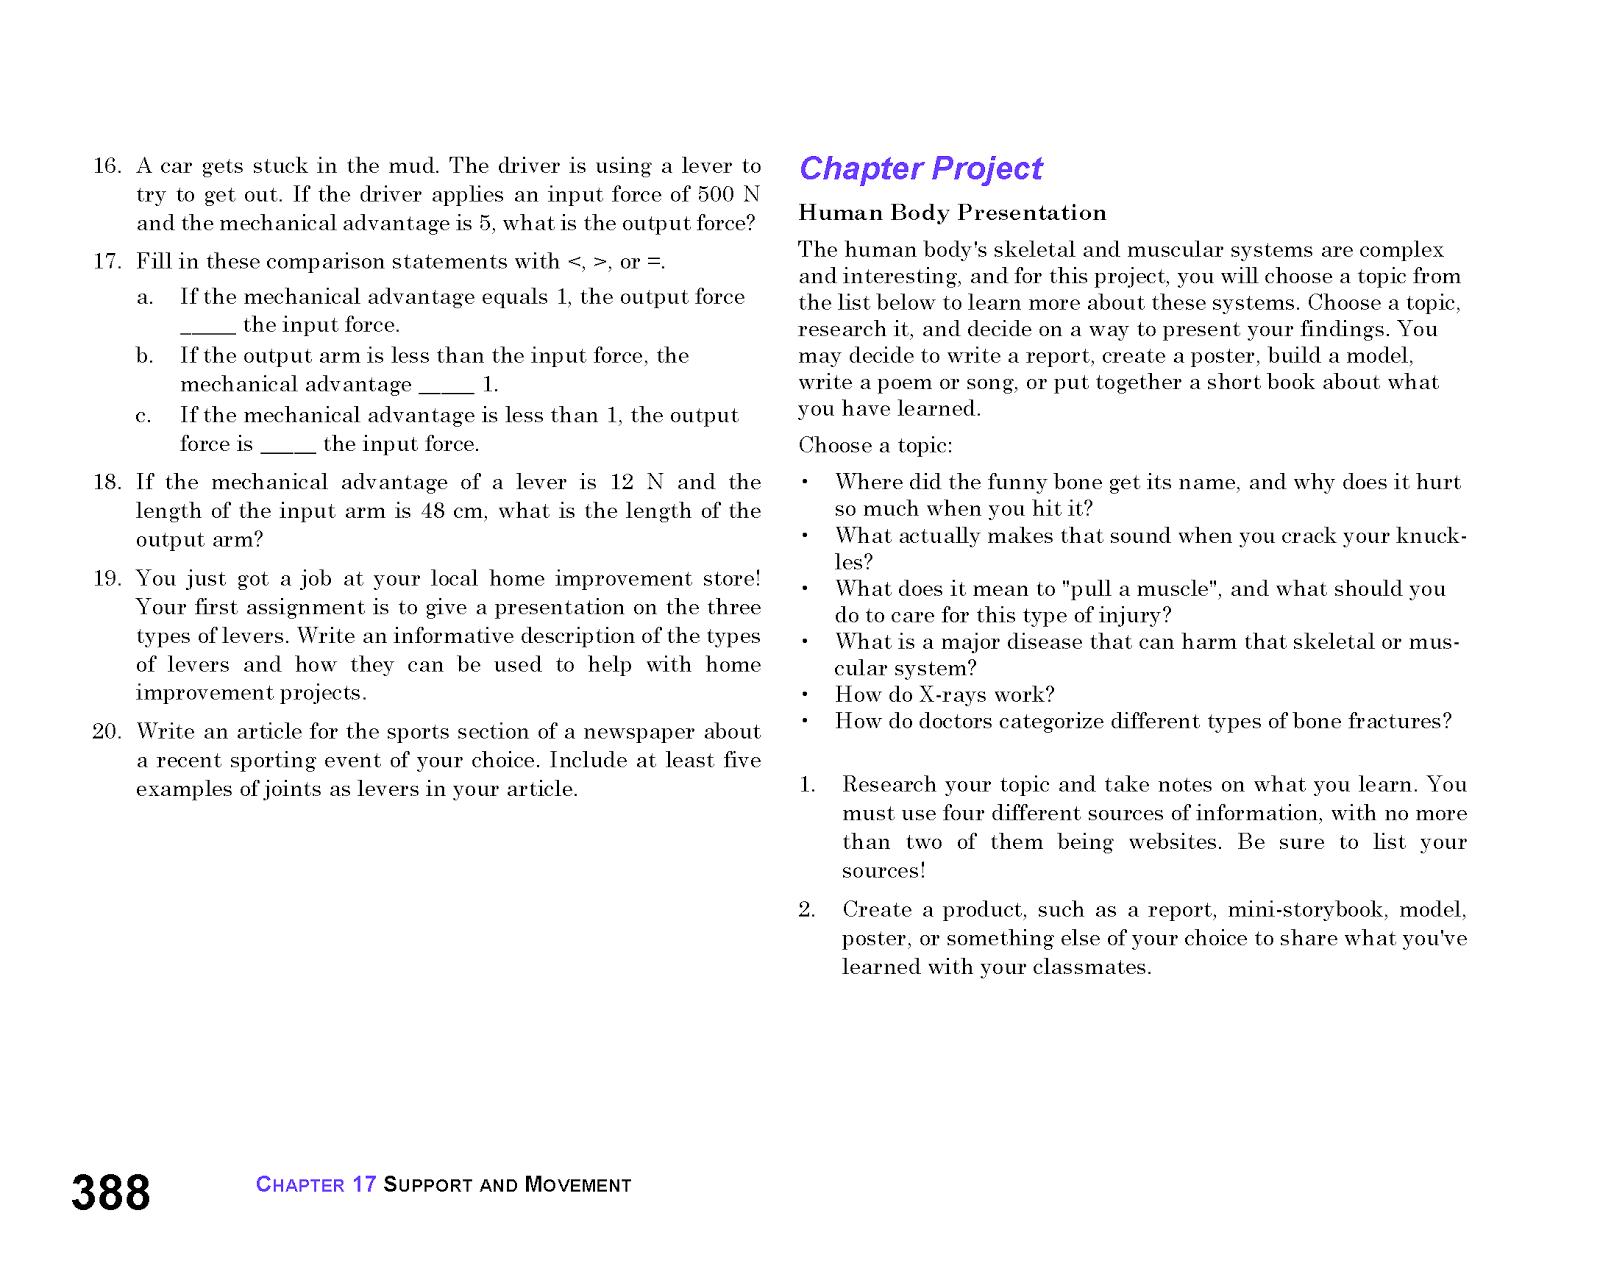 7th grade book report options